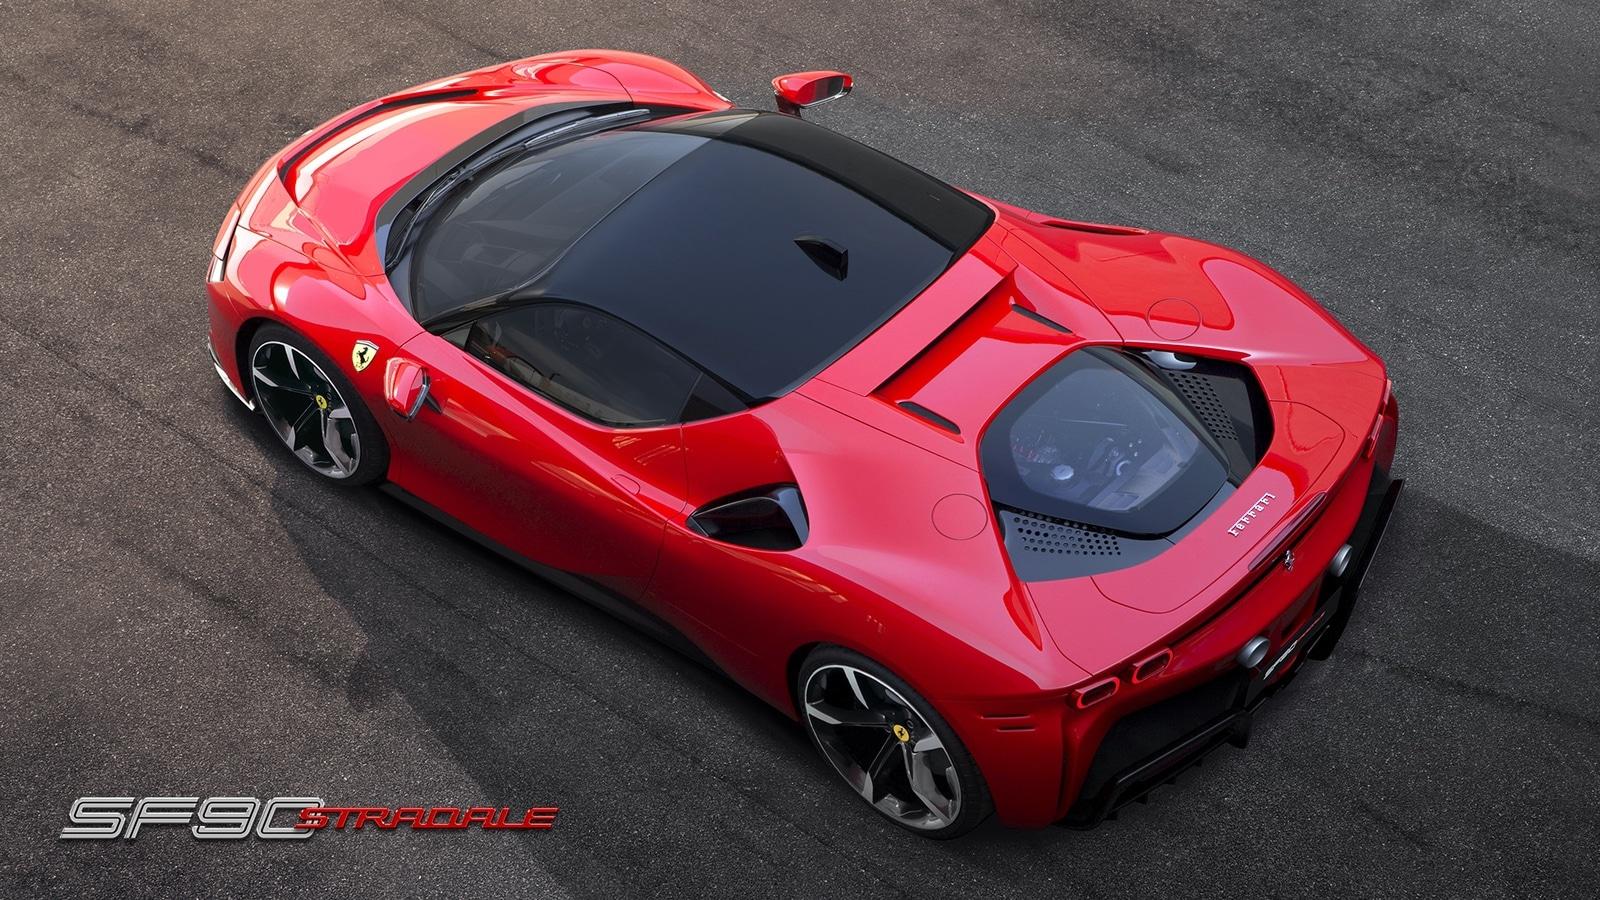 Ferrari SF90 Stradale – 1000 CV Hybrid (0-100 in 2.5 sec) 2